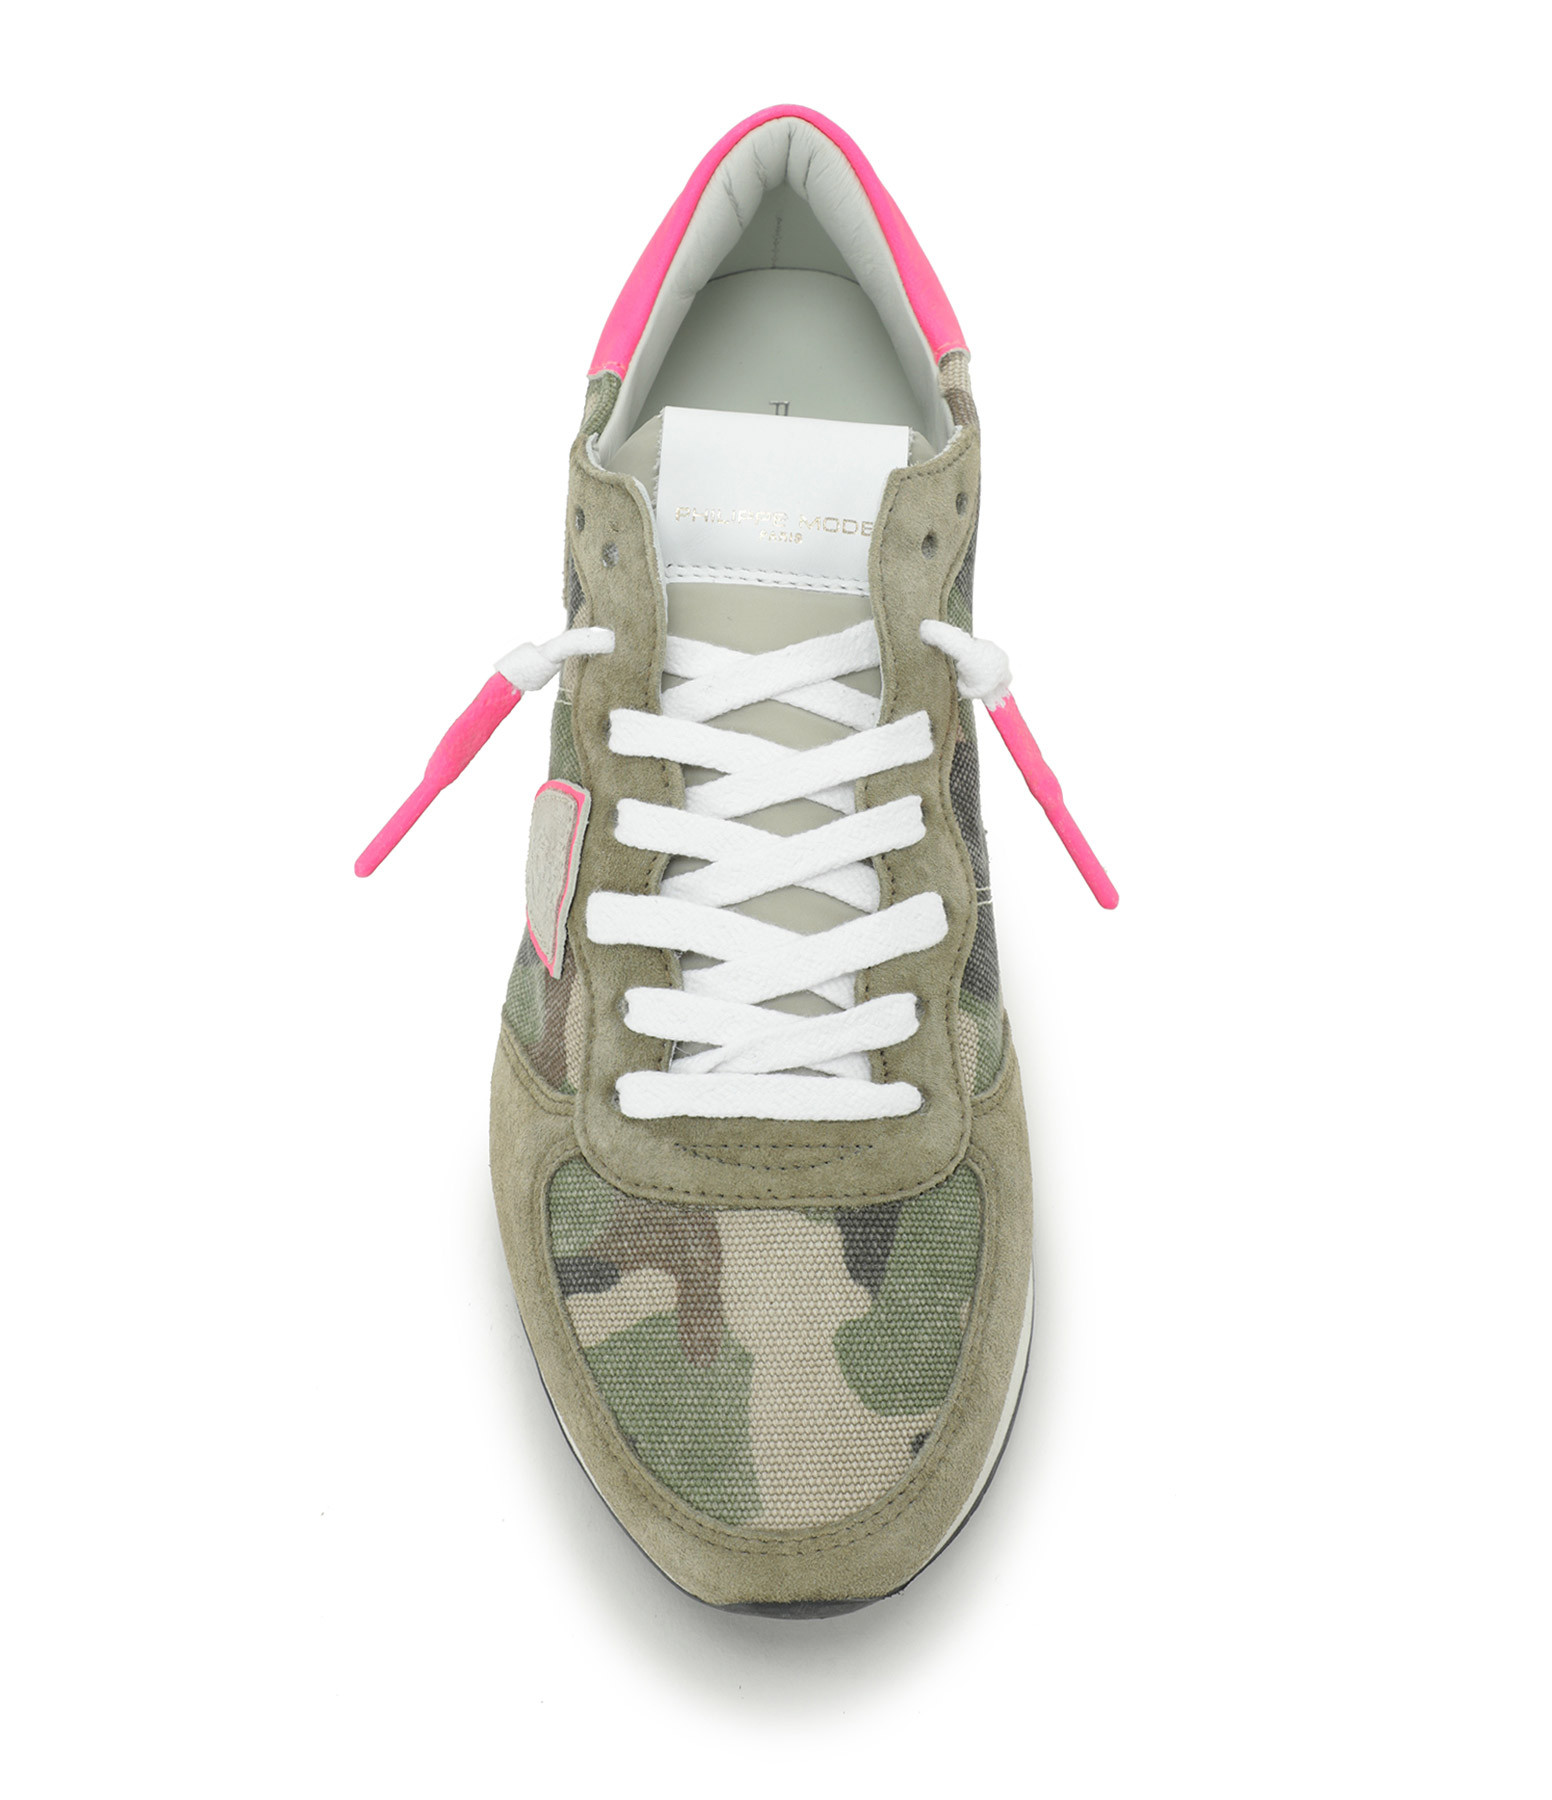 PHILIPPE MODEL - Baskets TRPX Low Camouflage Neon Vert Fushia